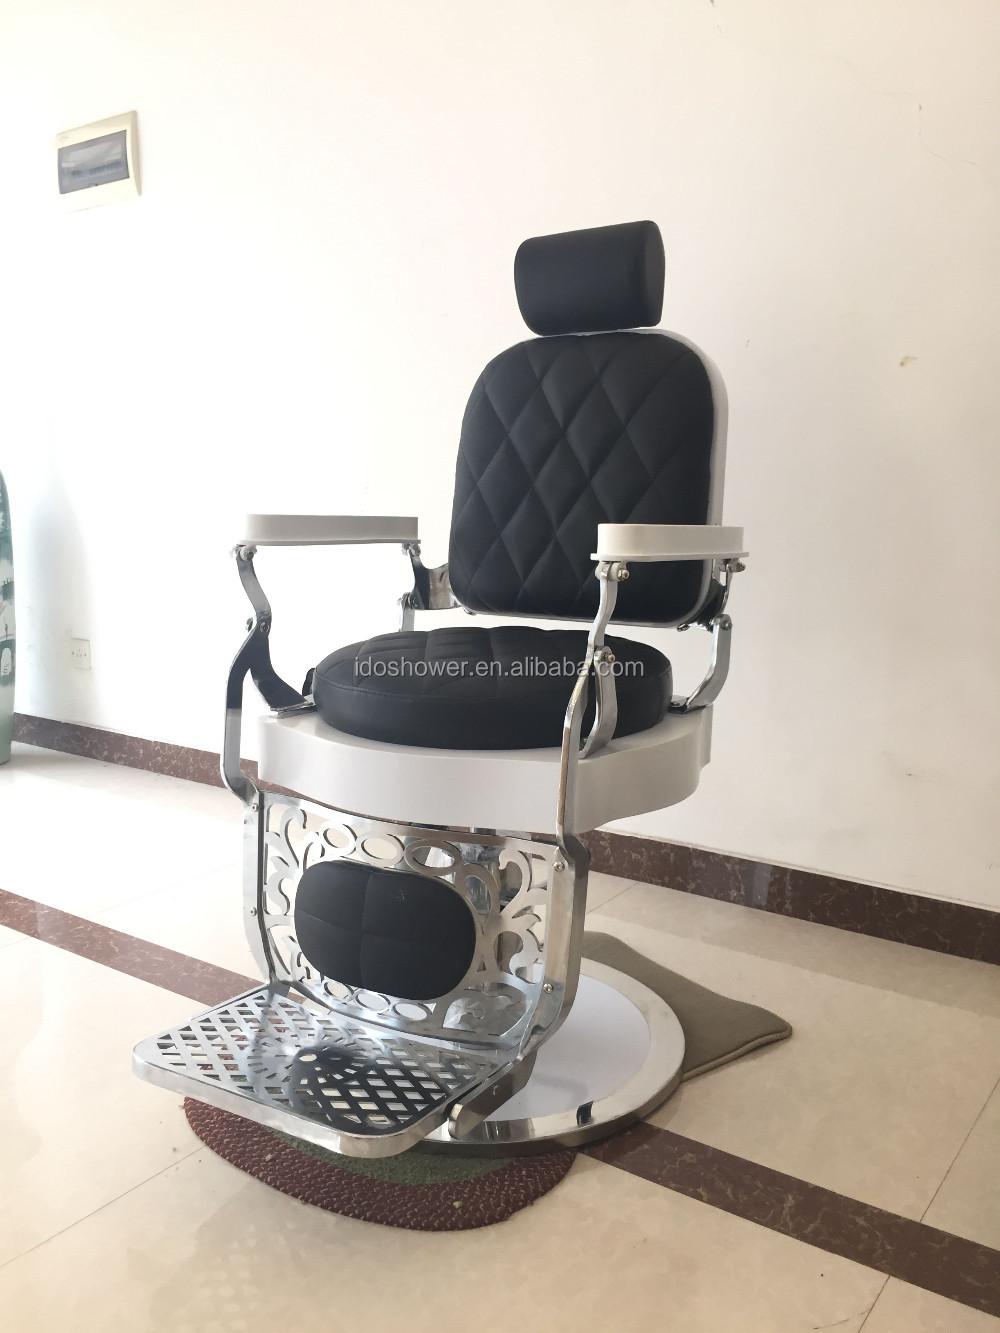 Doshower barber pole barber shop equipment used barber for Salon equipment for sale cheap